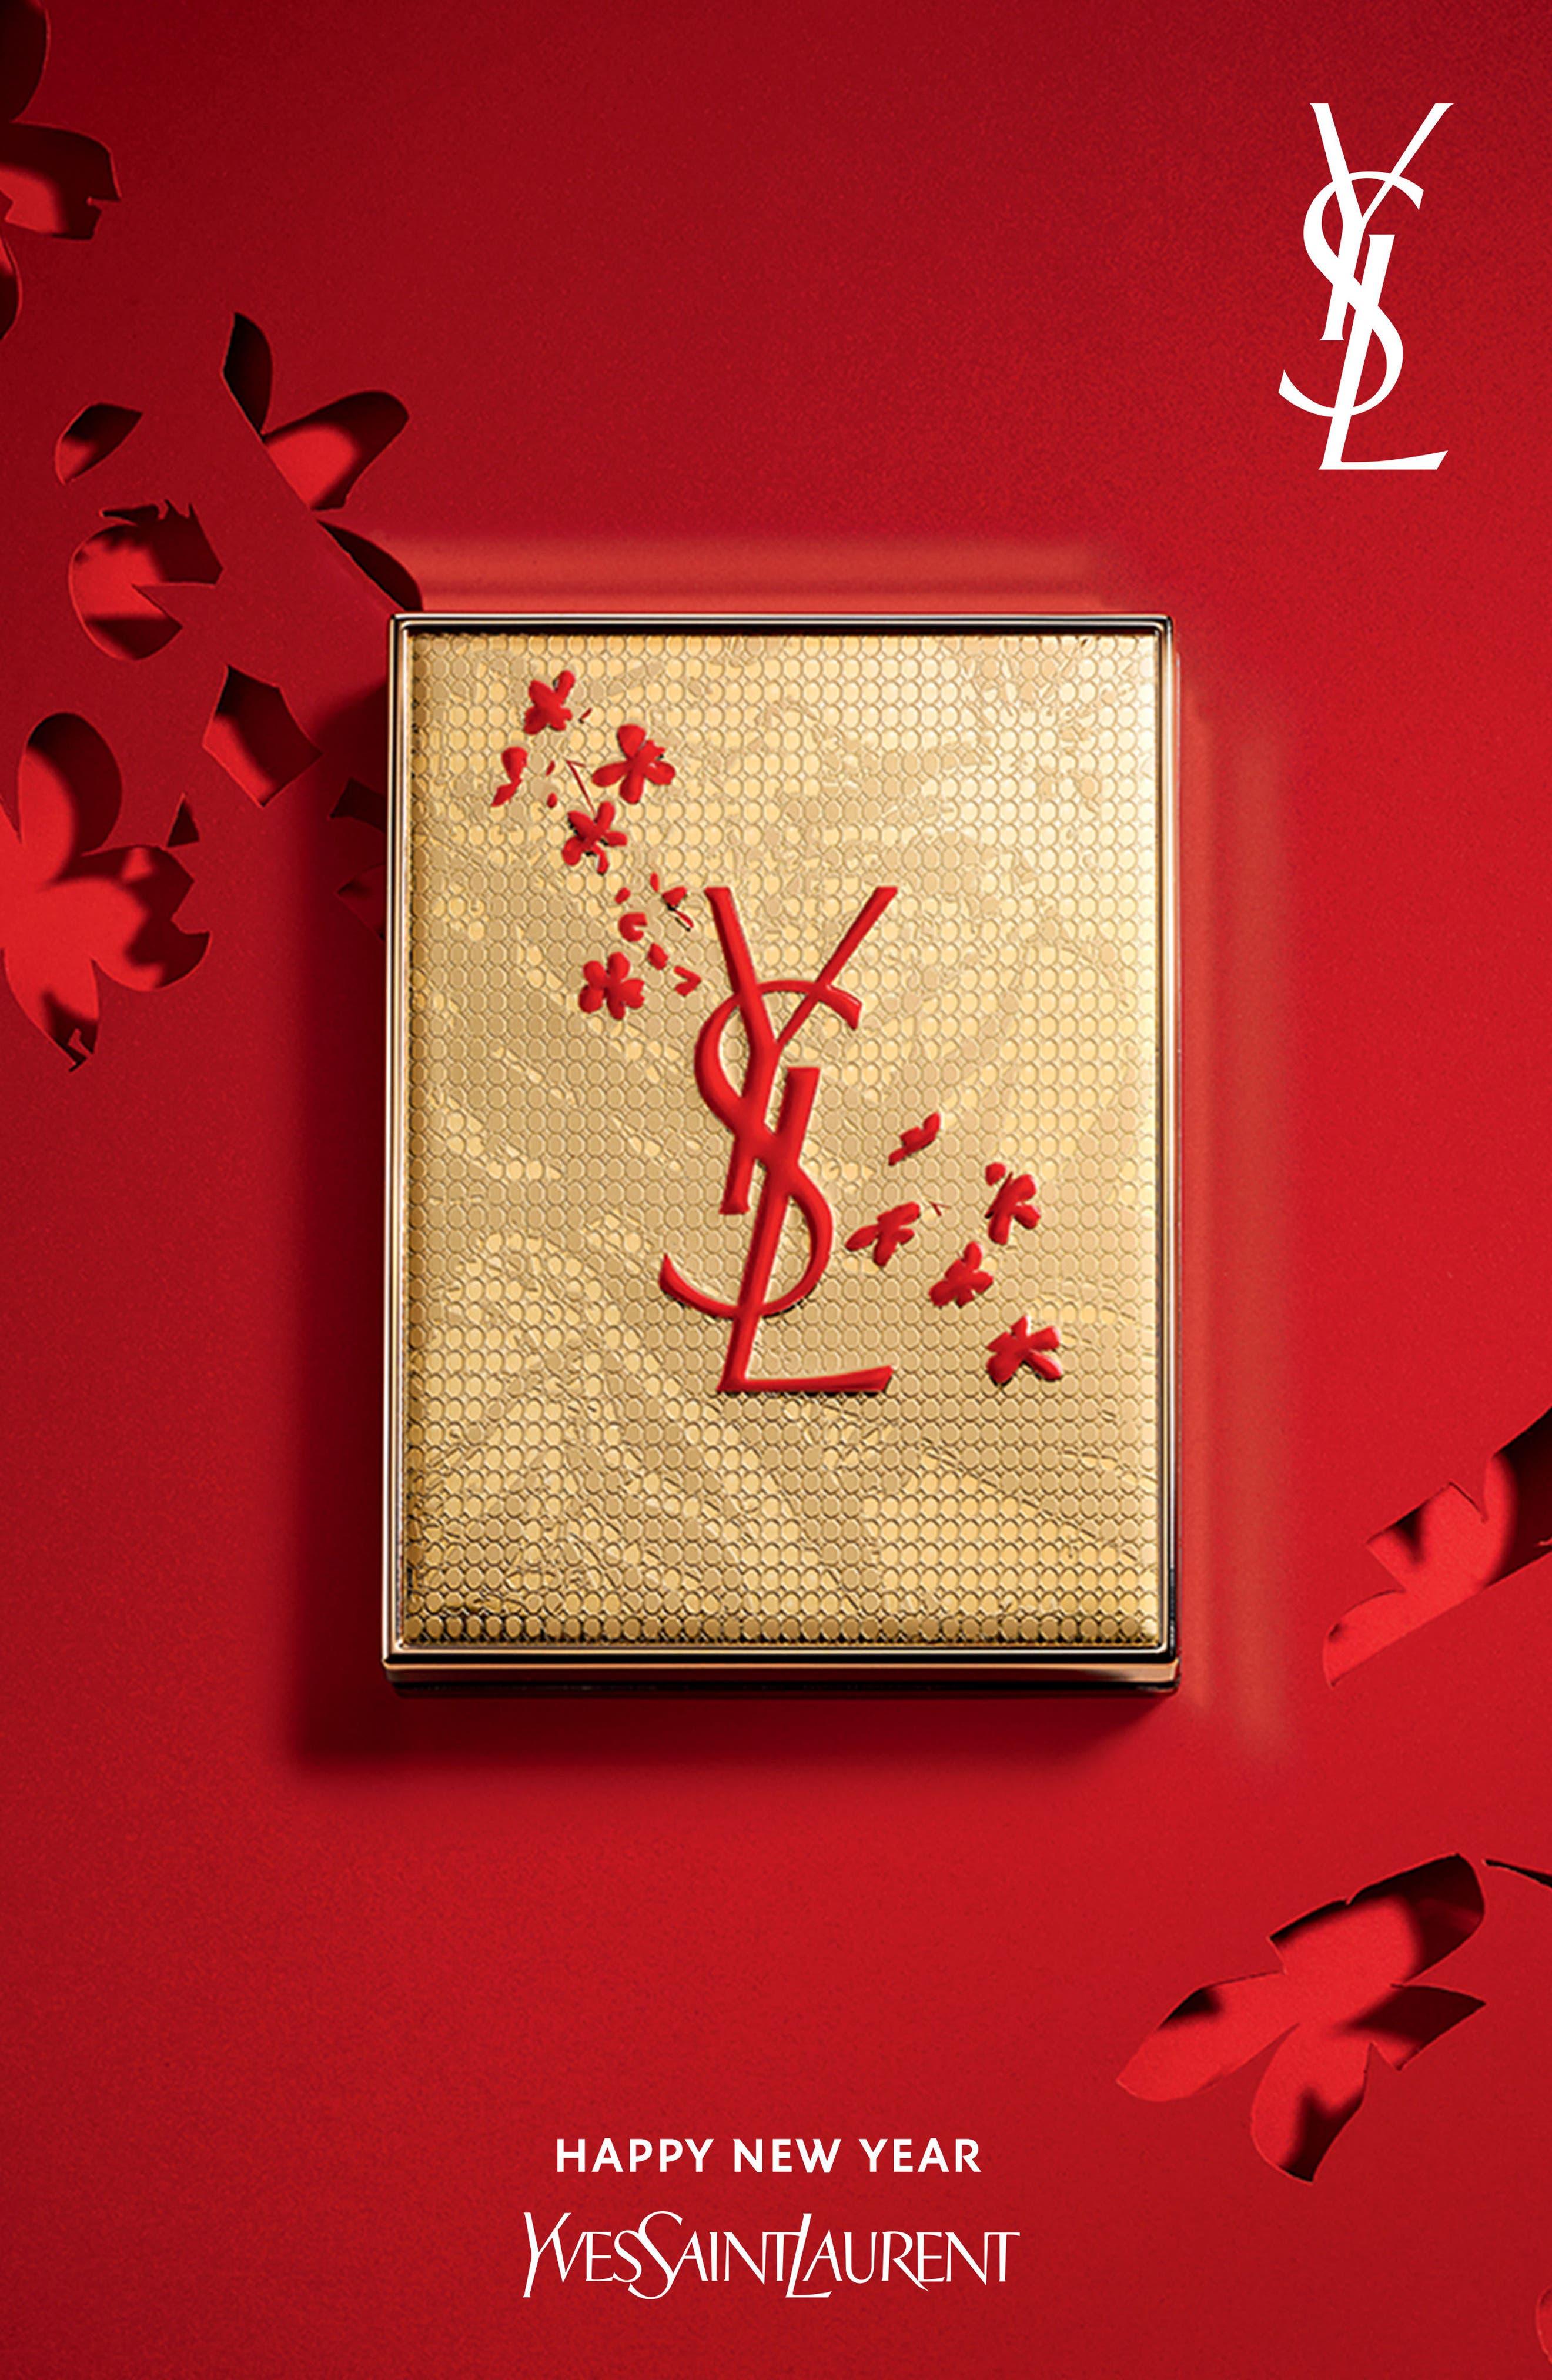 Chinese New Year Hope & Joy Blush Volupté Palette,                             Alternate thumbnail 4, color,